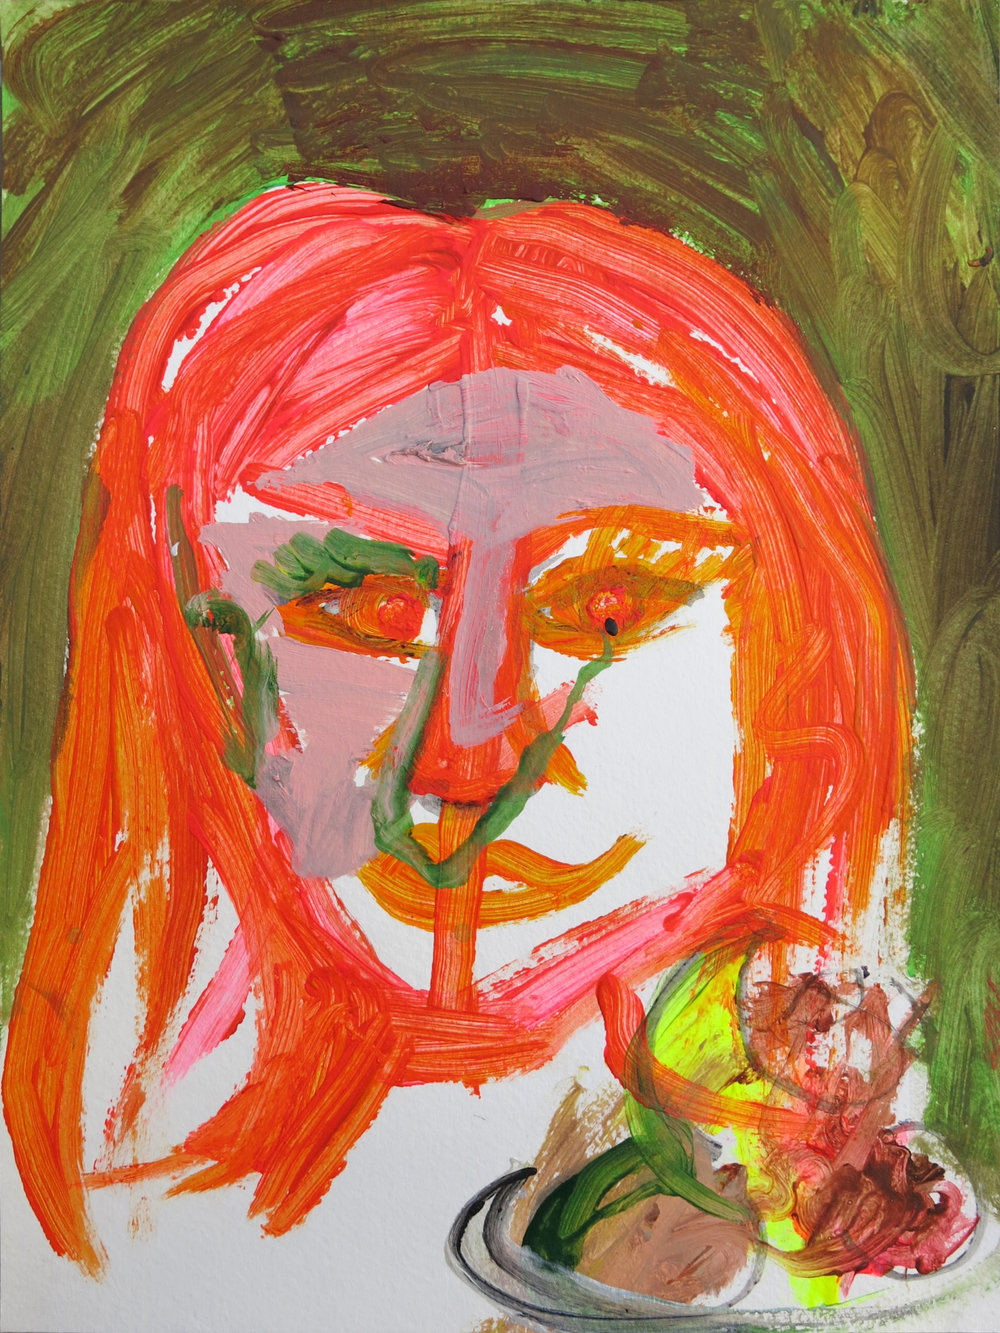 Barbra Streisand Portrait #140